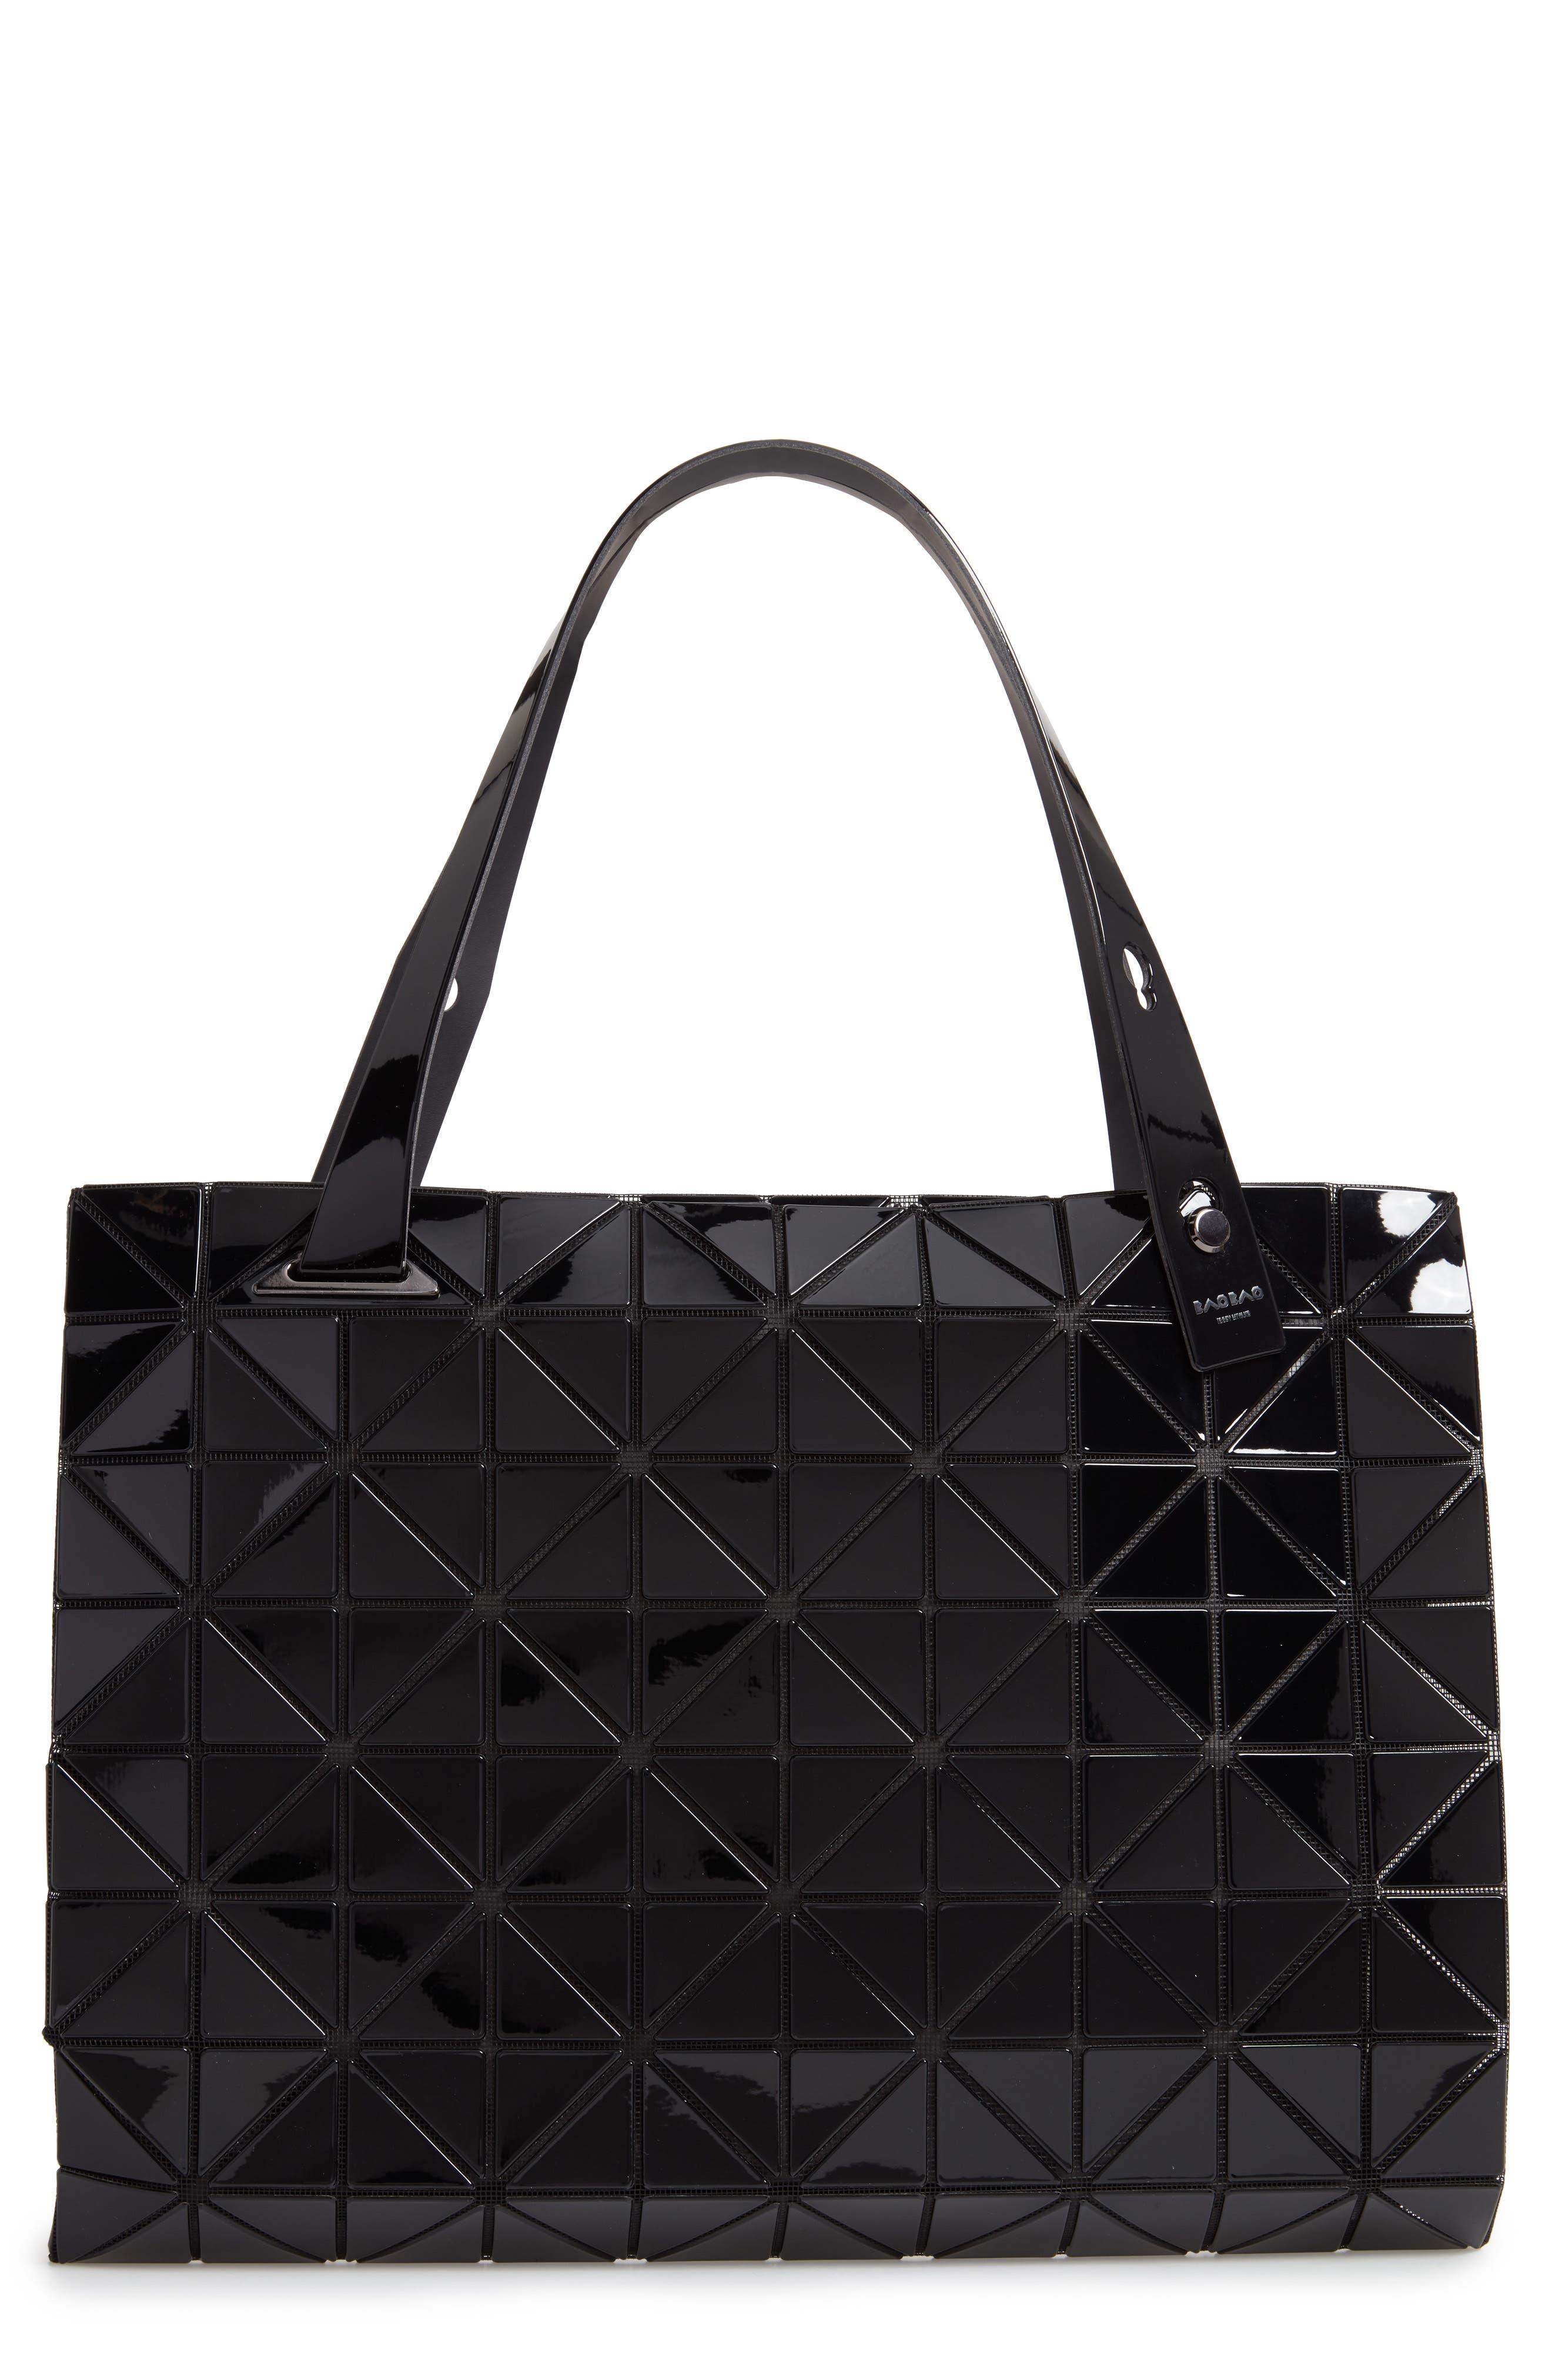 BAO BAO ISSEY MIYAKE Carton Prism Tote Bag, Main, color, JET BLACK